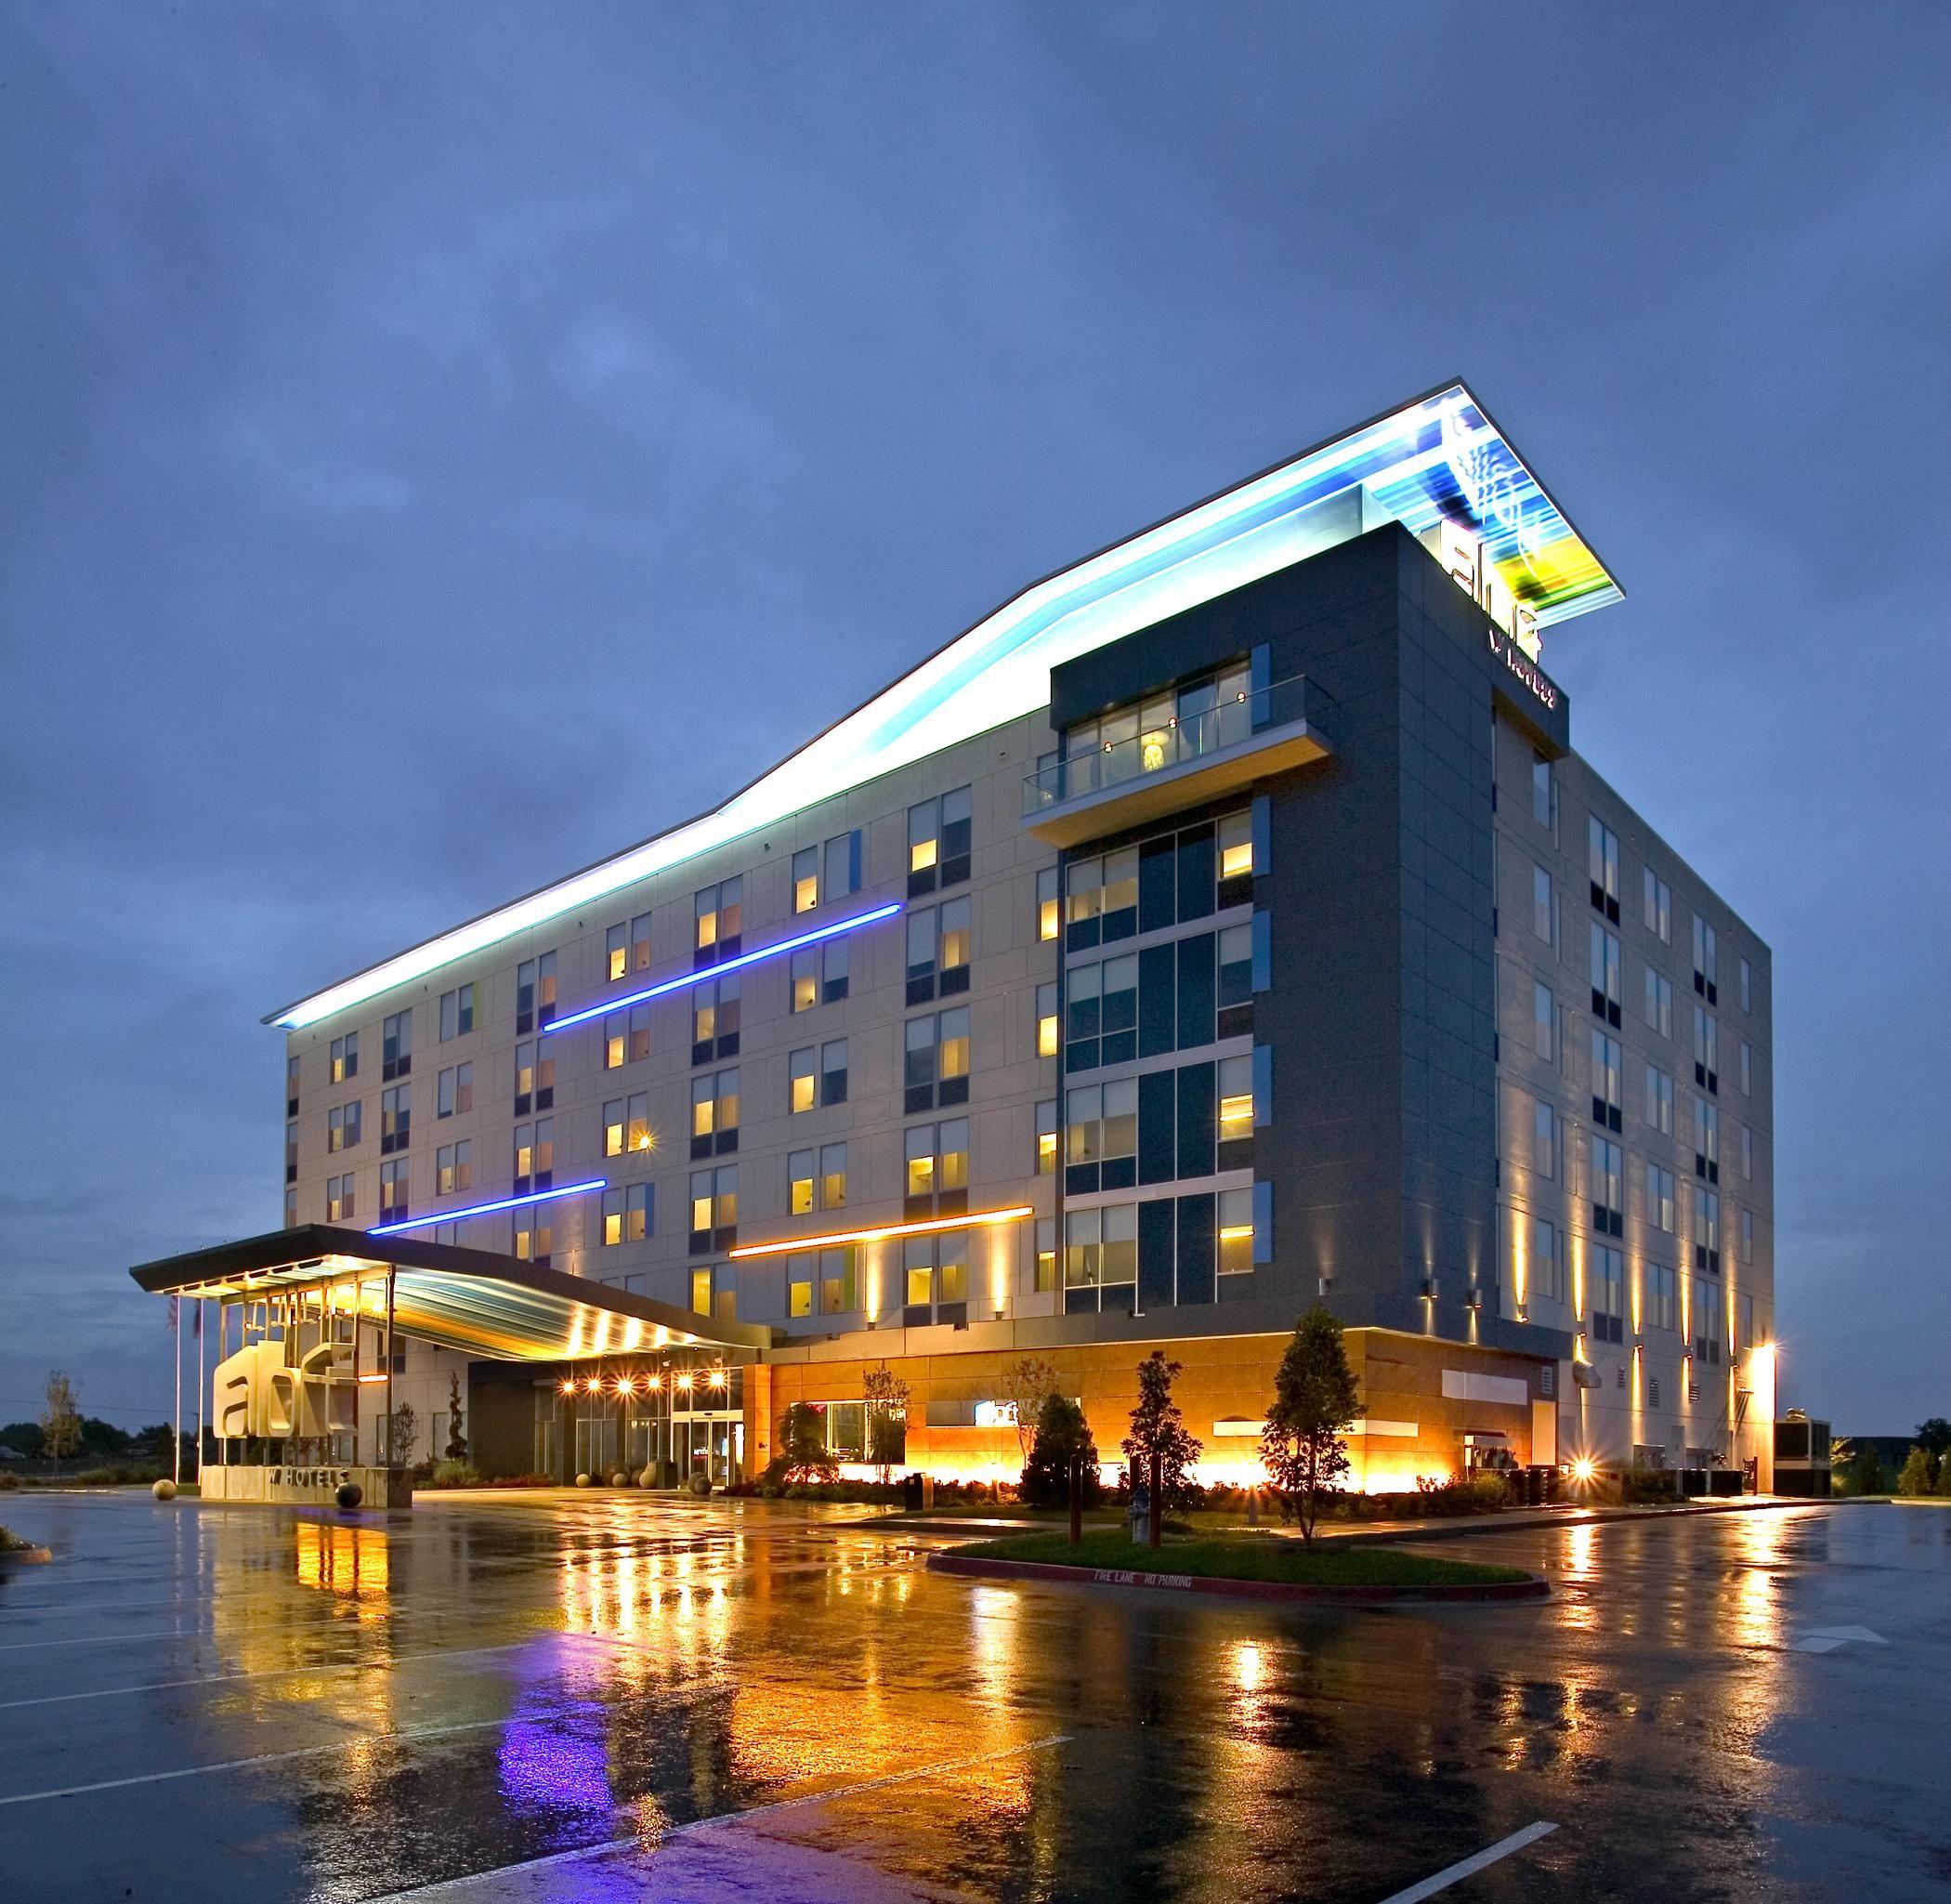 Aloft Hotels, Hotel, Hotel Deals